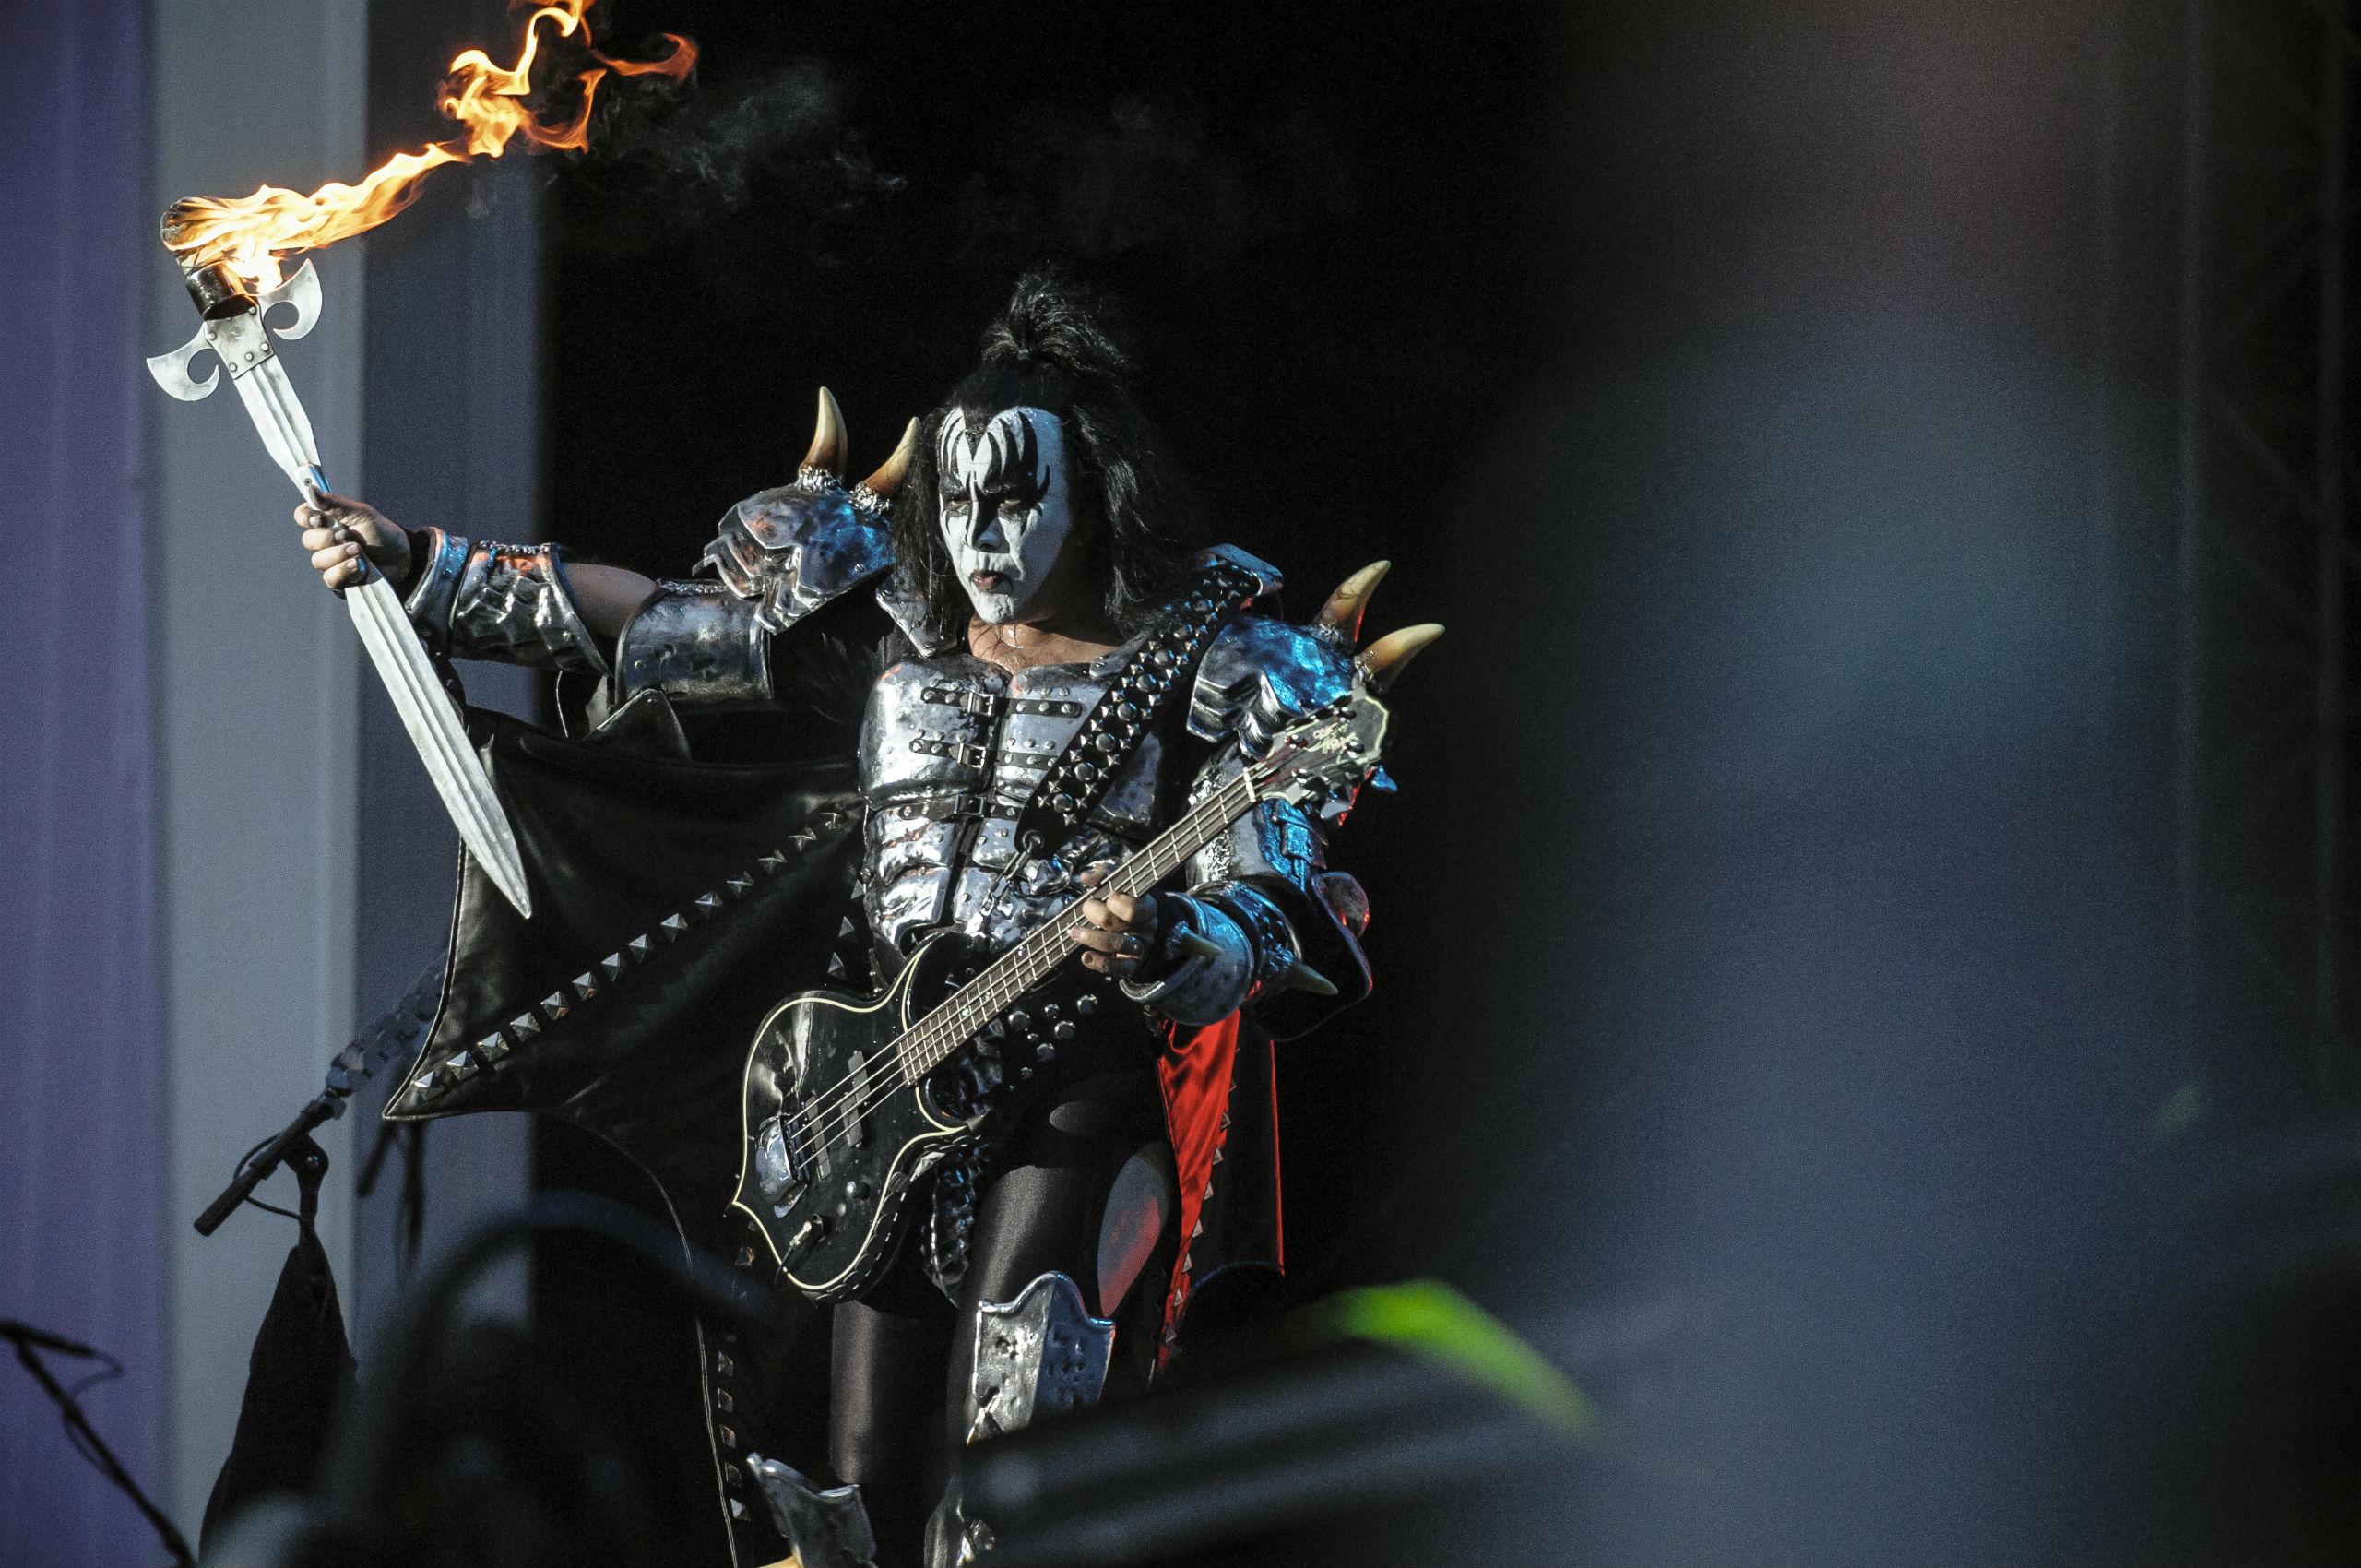 Kiss heavy metal rock bands concert guitar v wallpaper background 2560x1700